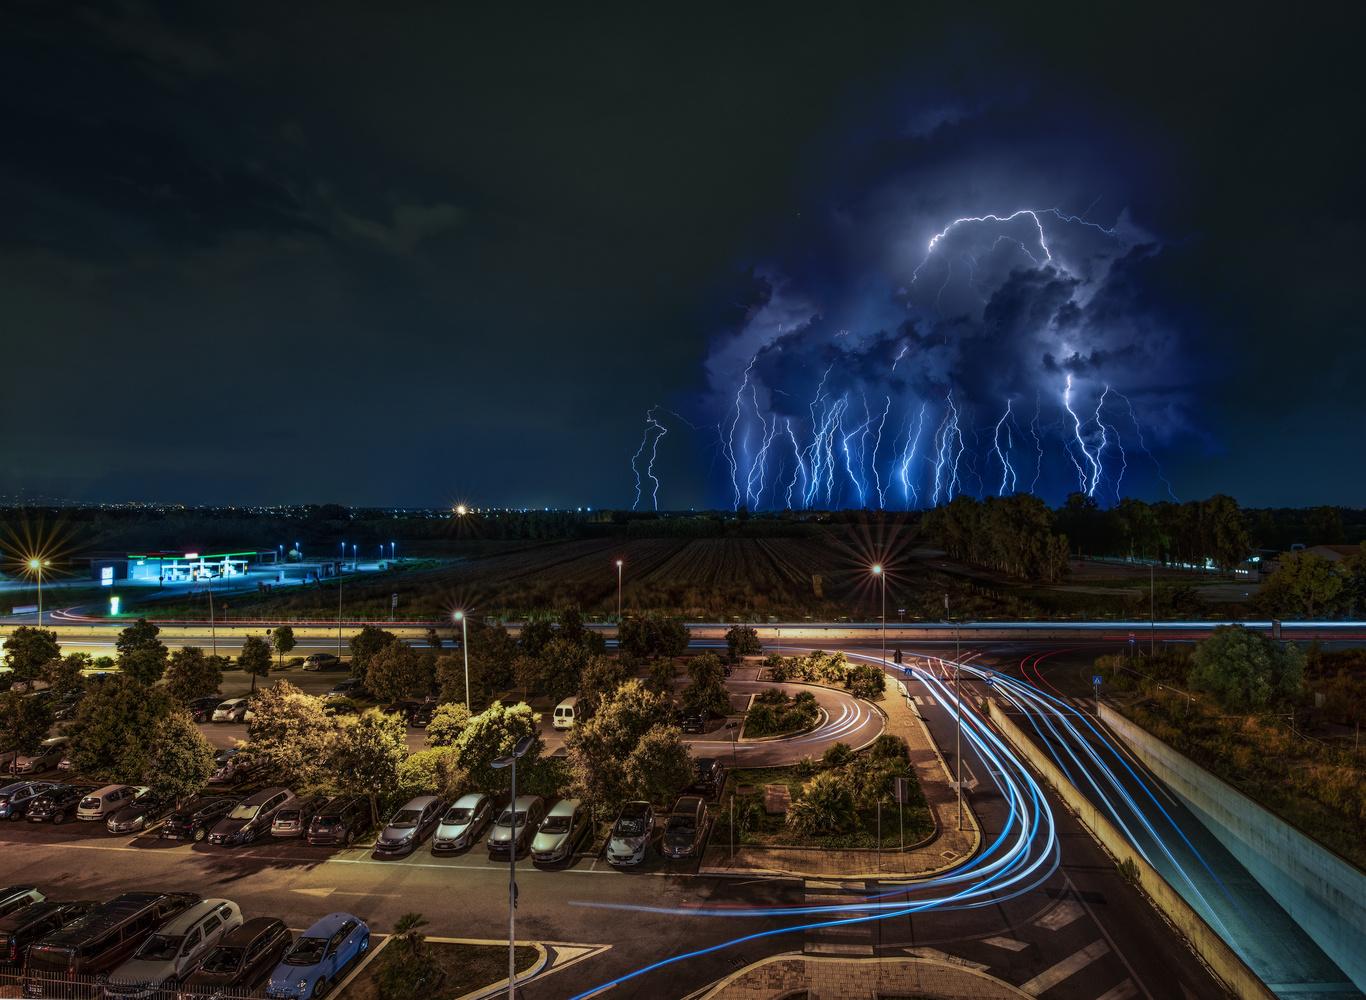 Thunder storm at Fiumicino by Fabio De Leonardis